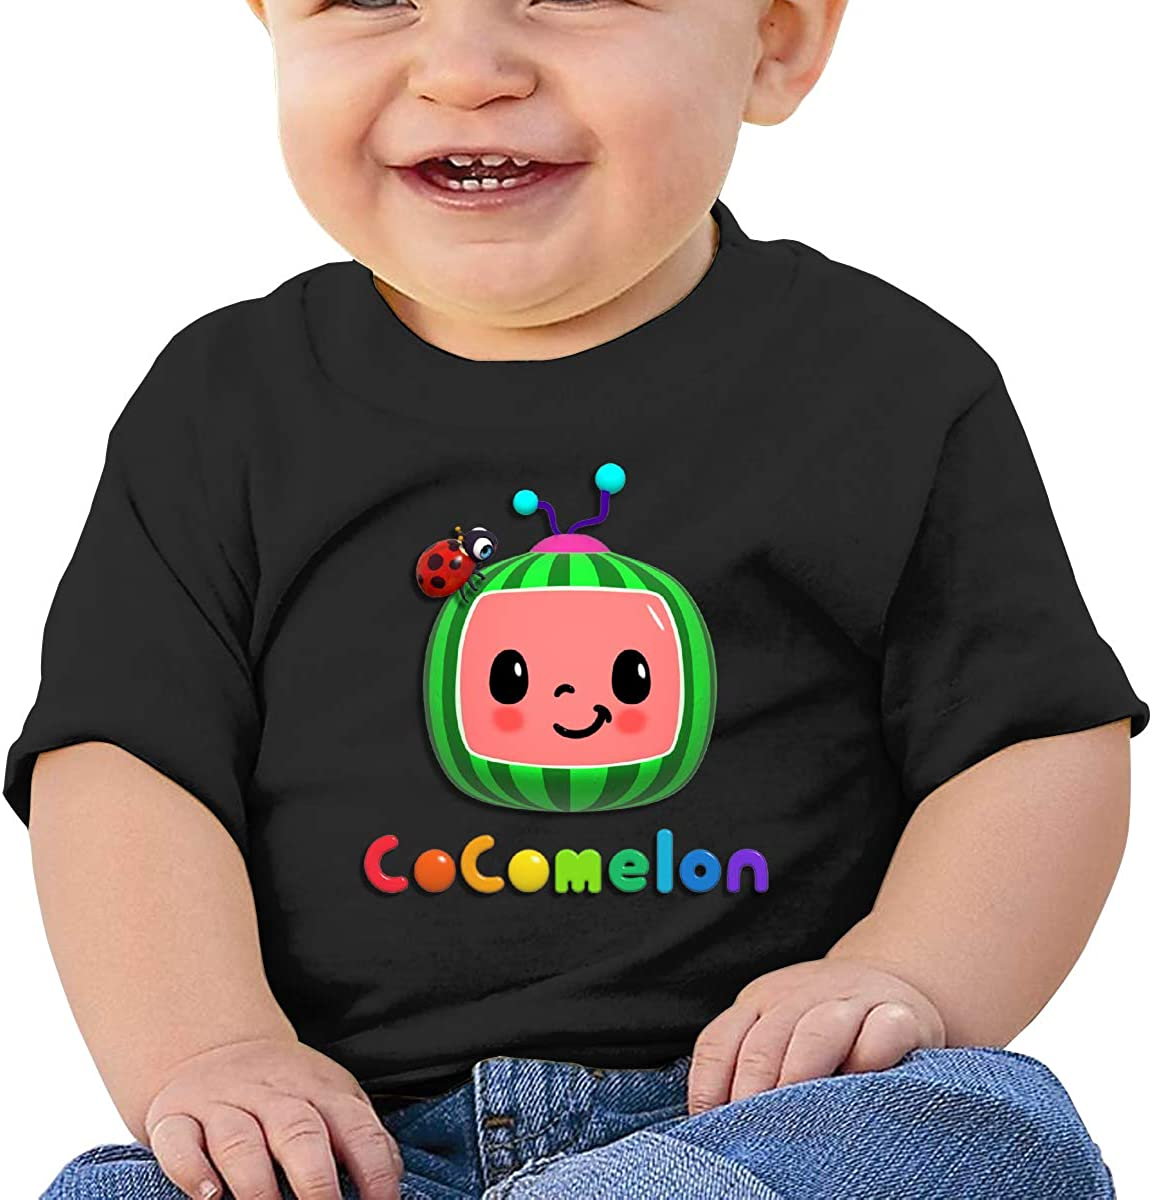 Kangtians Baby Cocomelon Short Sleeve Shirt Toddler Tee